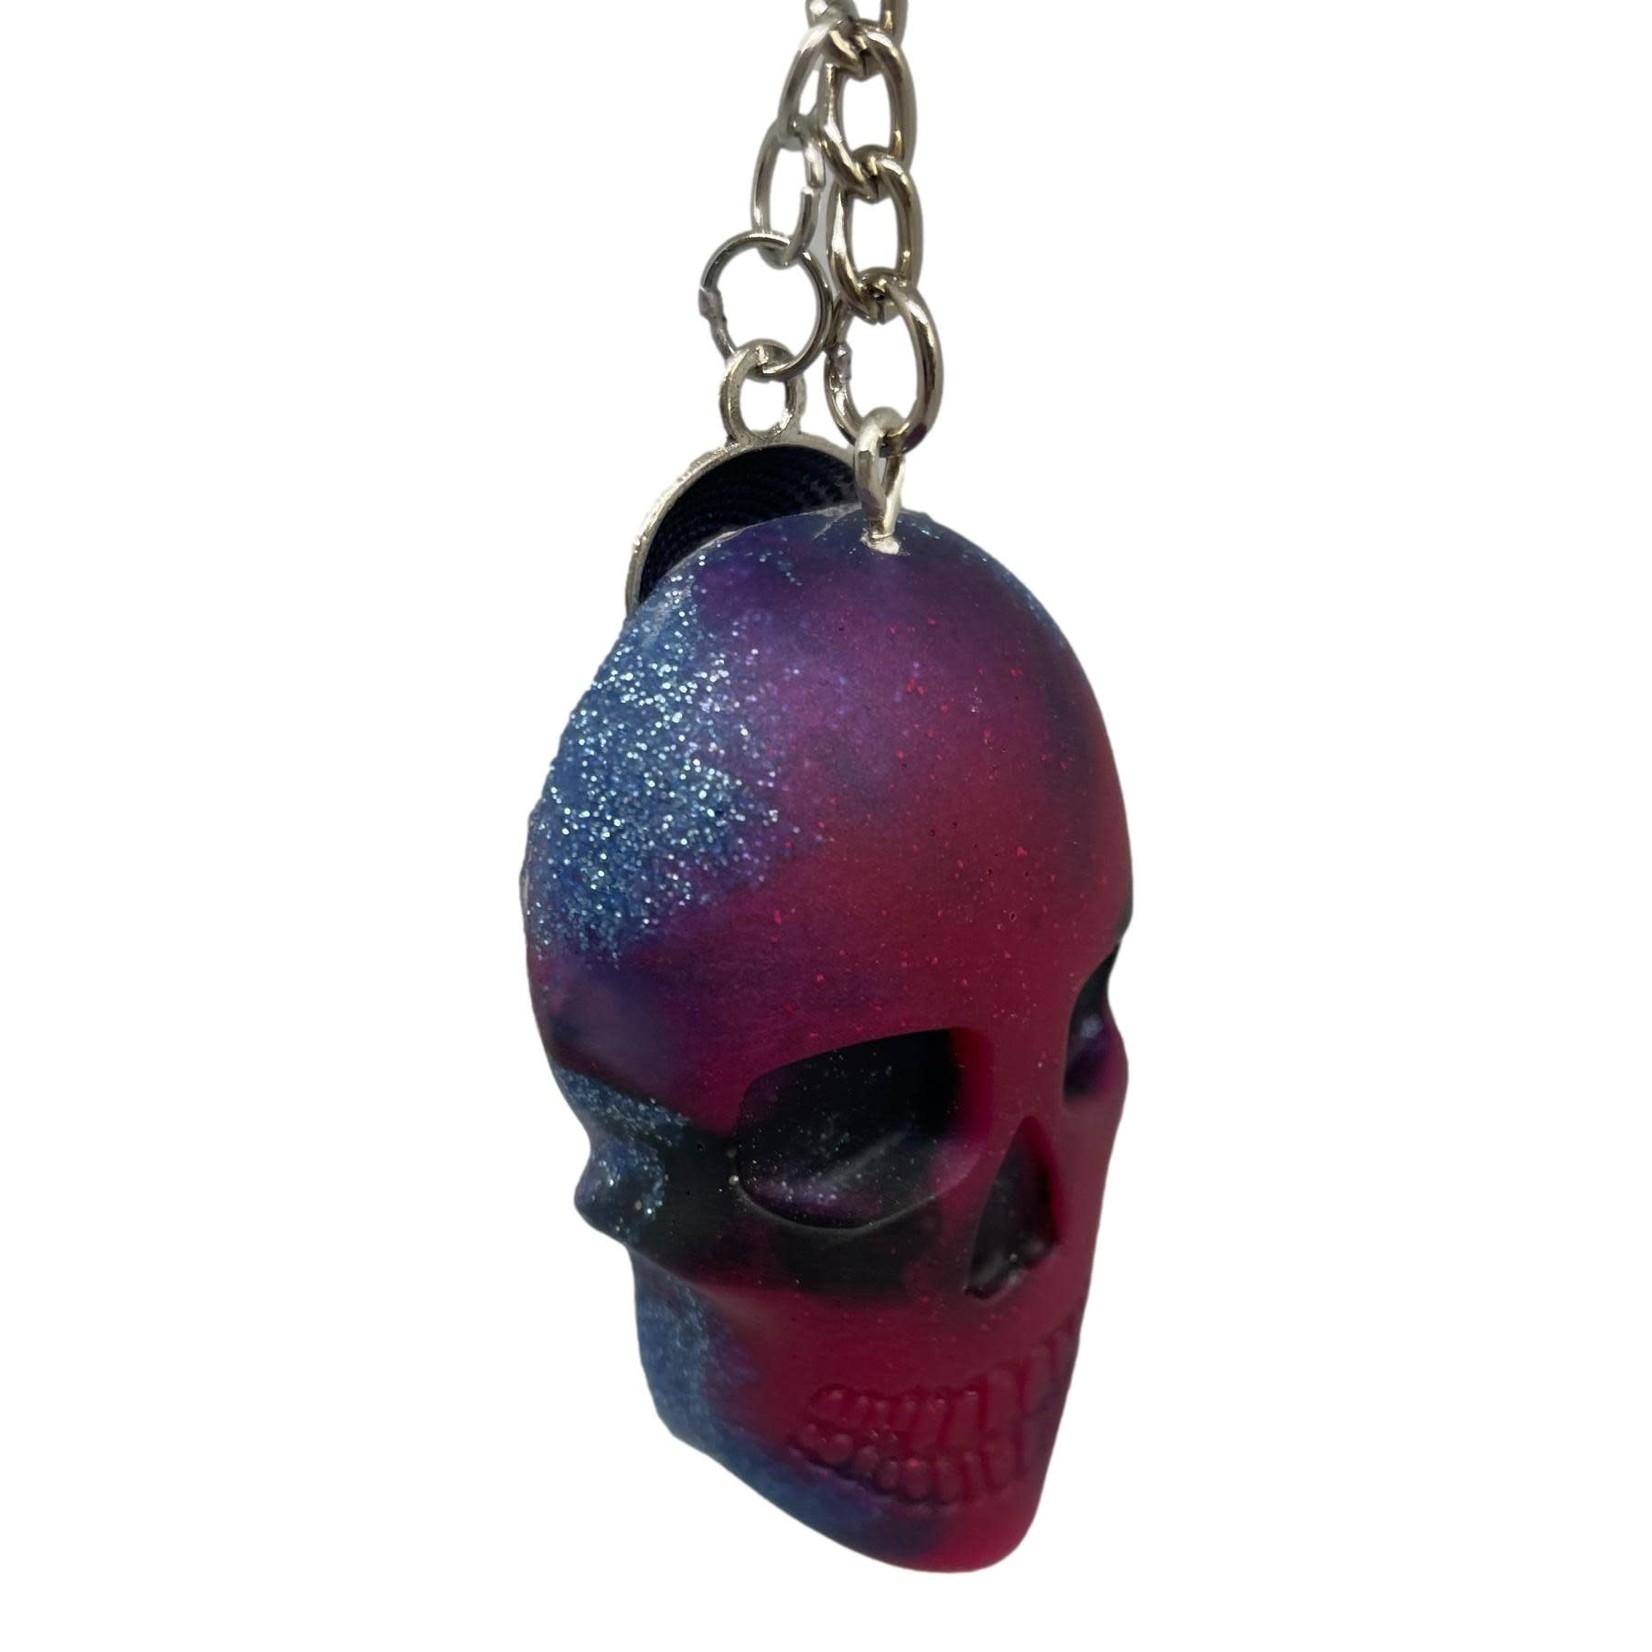 East Coast Sirens Deep Red & Blue Skull Keychain